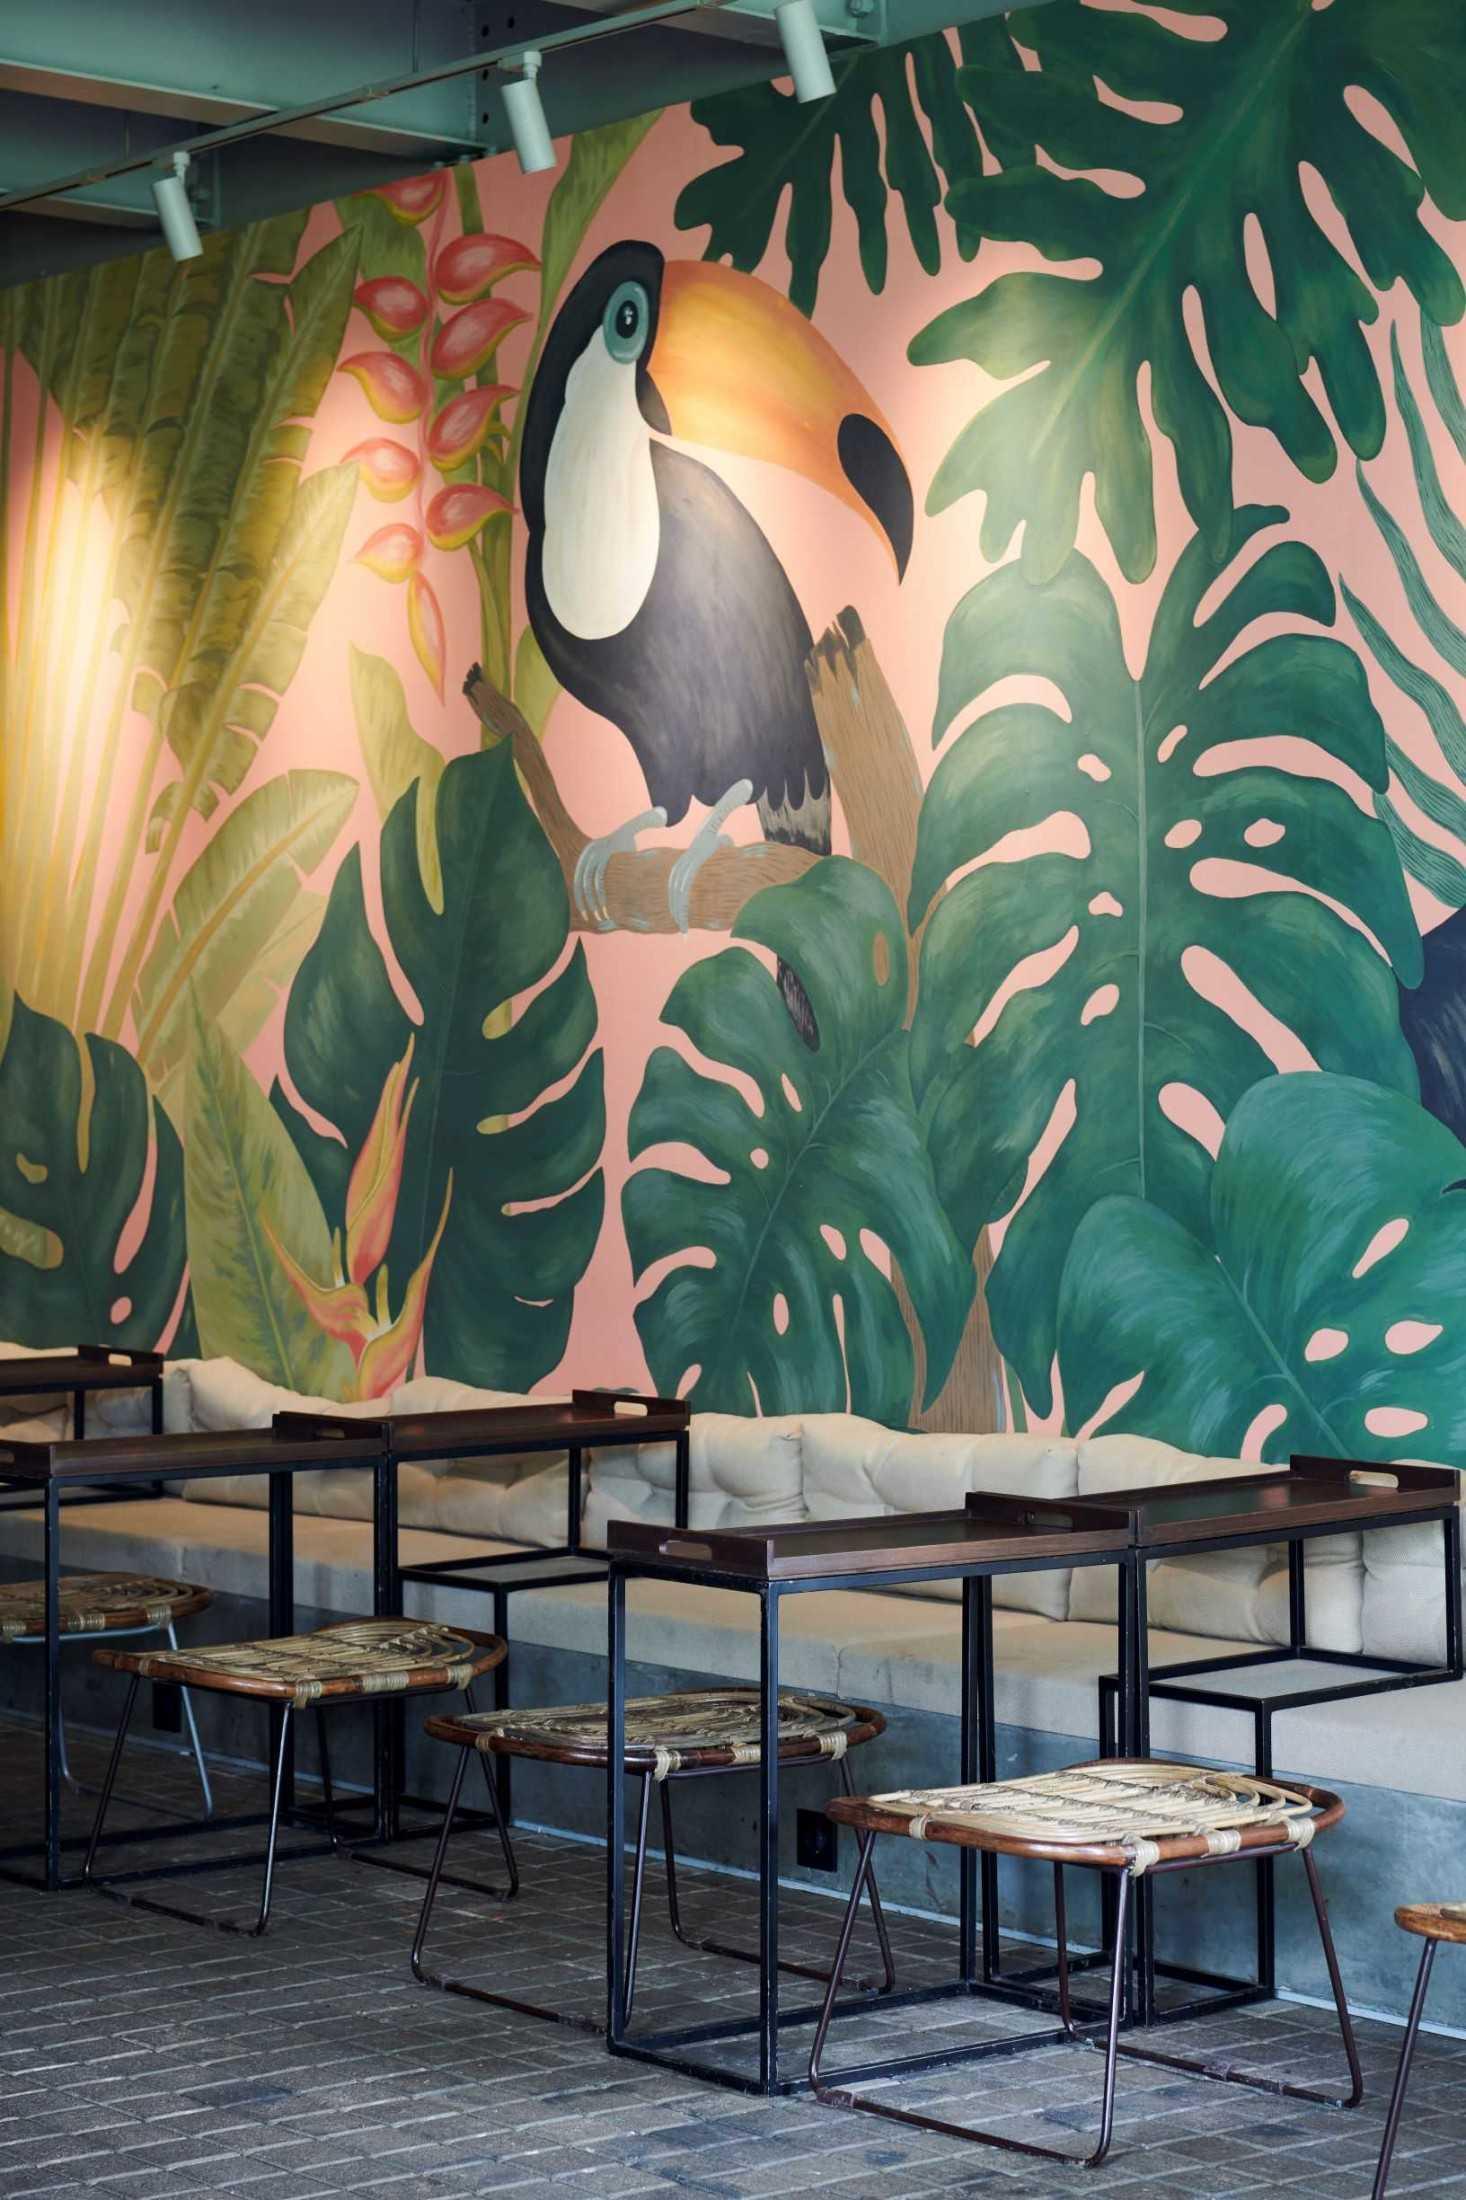 Hadivincent Architects Oval Bar Ciumbuleuit, Cidadap, Kota Bandung, Jawa Barat, Indonesia Ciumbuleuit, Cidadap, Kota Bandung, Jawa Barat, Indonesia Hadivincent-Architects-Oval-Bar  71522